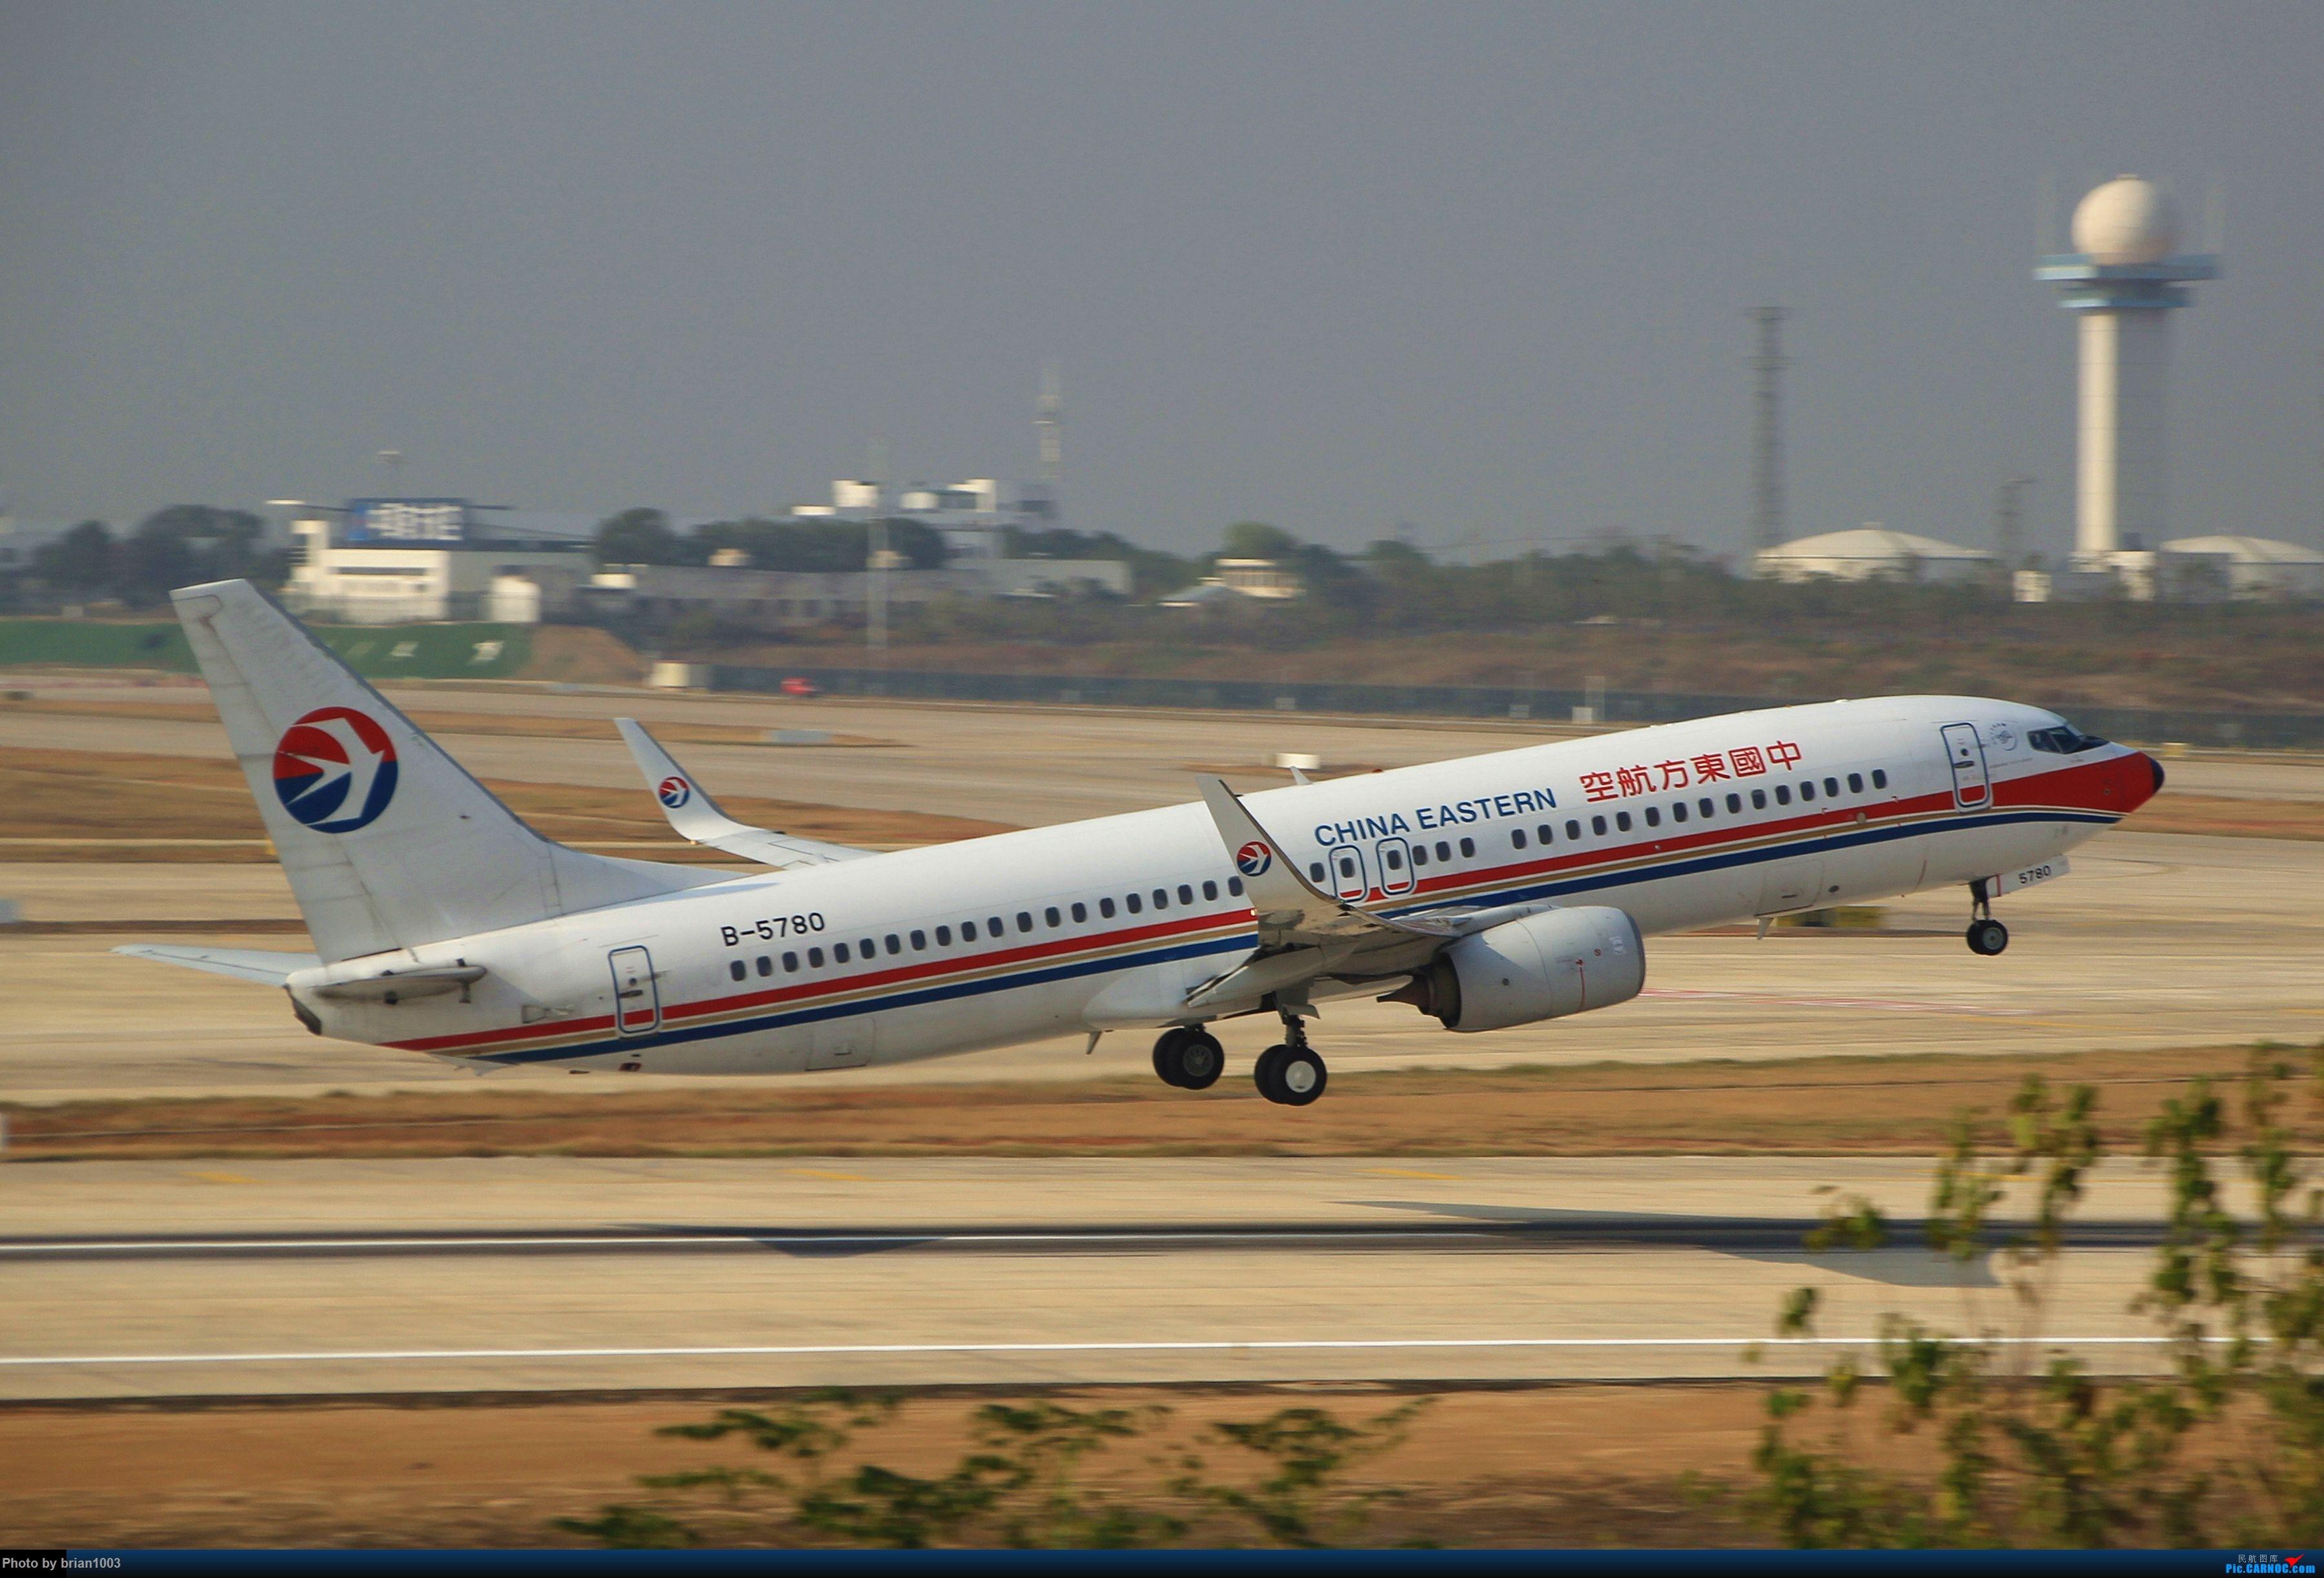 Re:[原创]WUH武汉天河机场拍机之新航季来的海航333和幸福的738 BOEING 737-800 B-5780 中国武汉天河国际机场